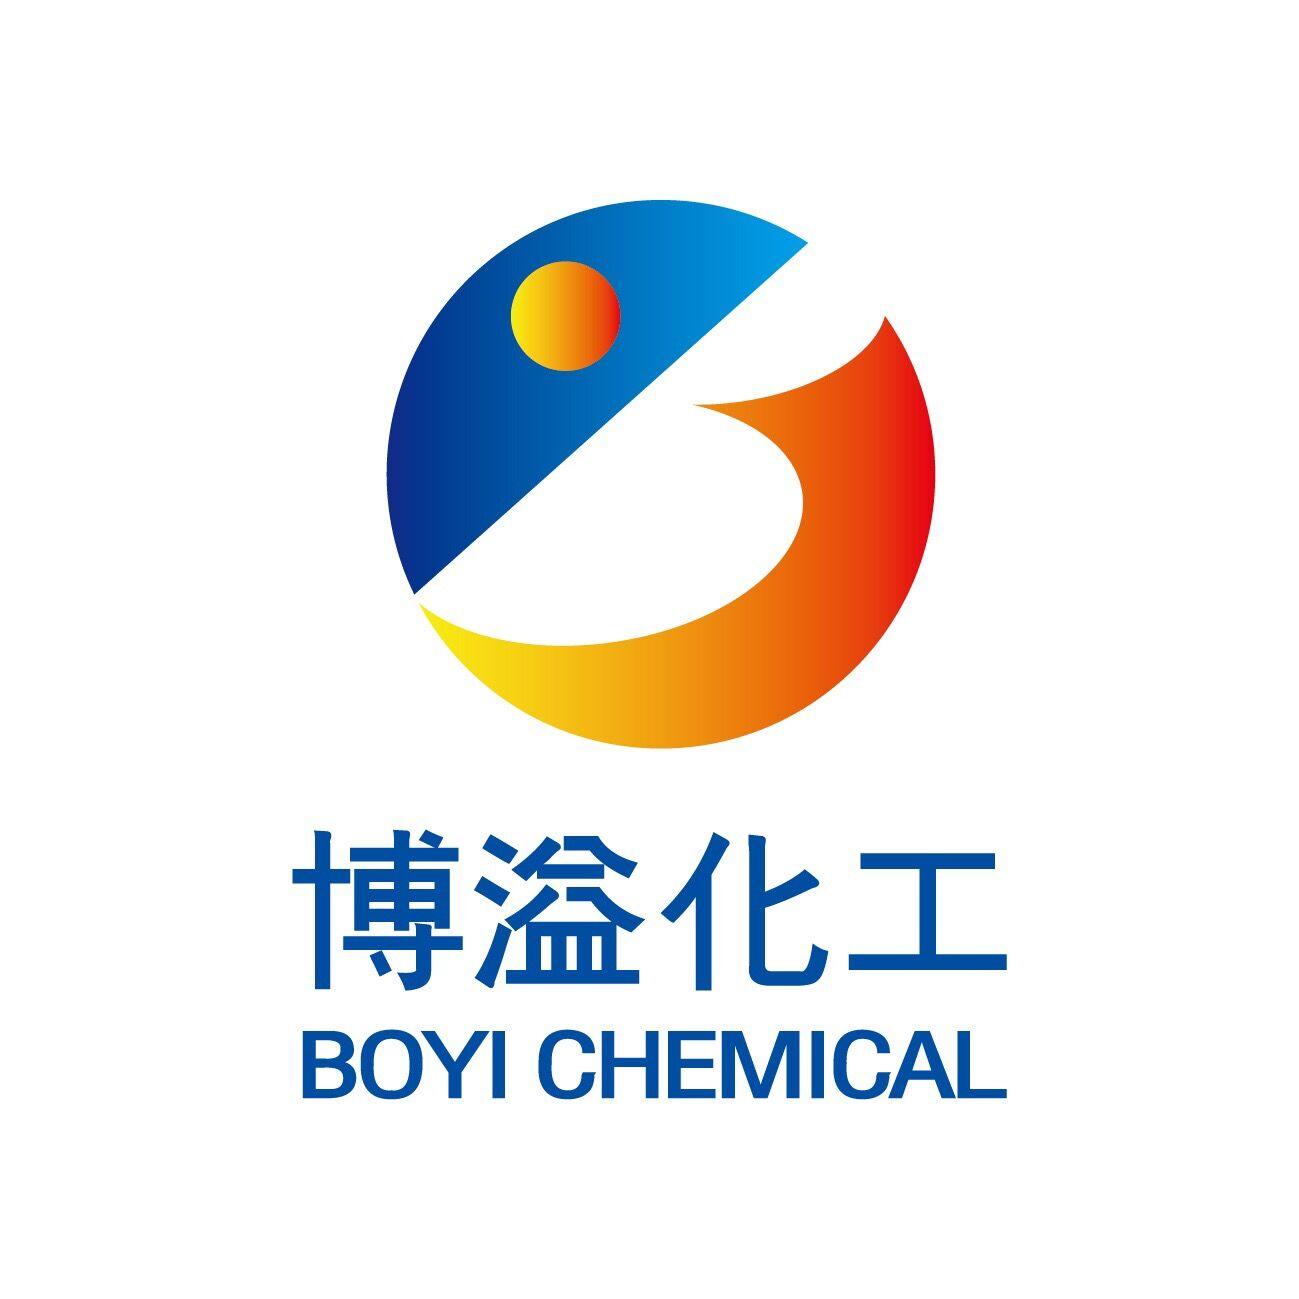 Zouping Boyi Chemical Industry Co., Ltd